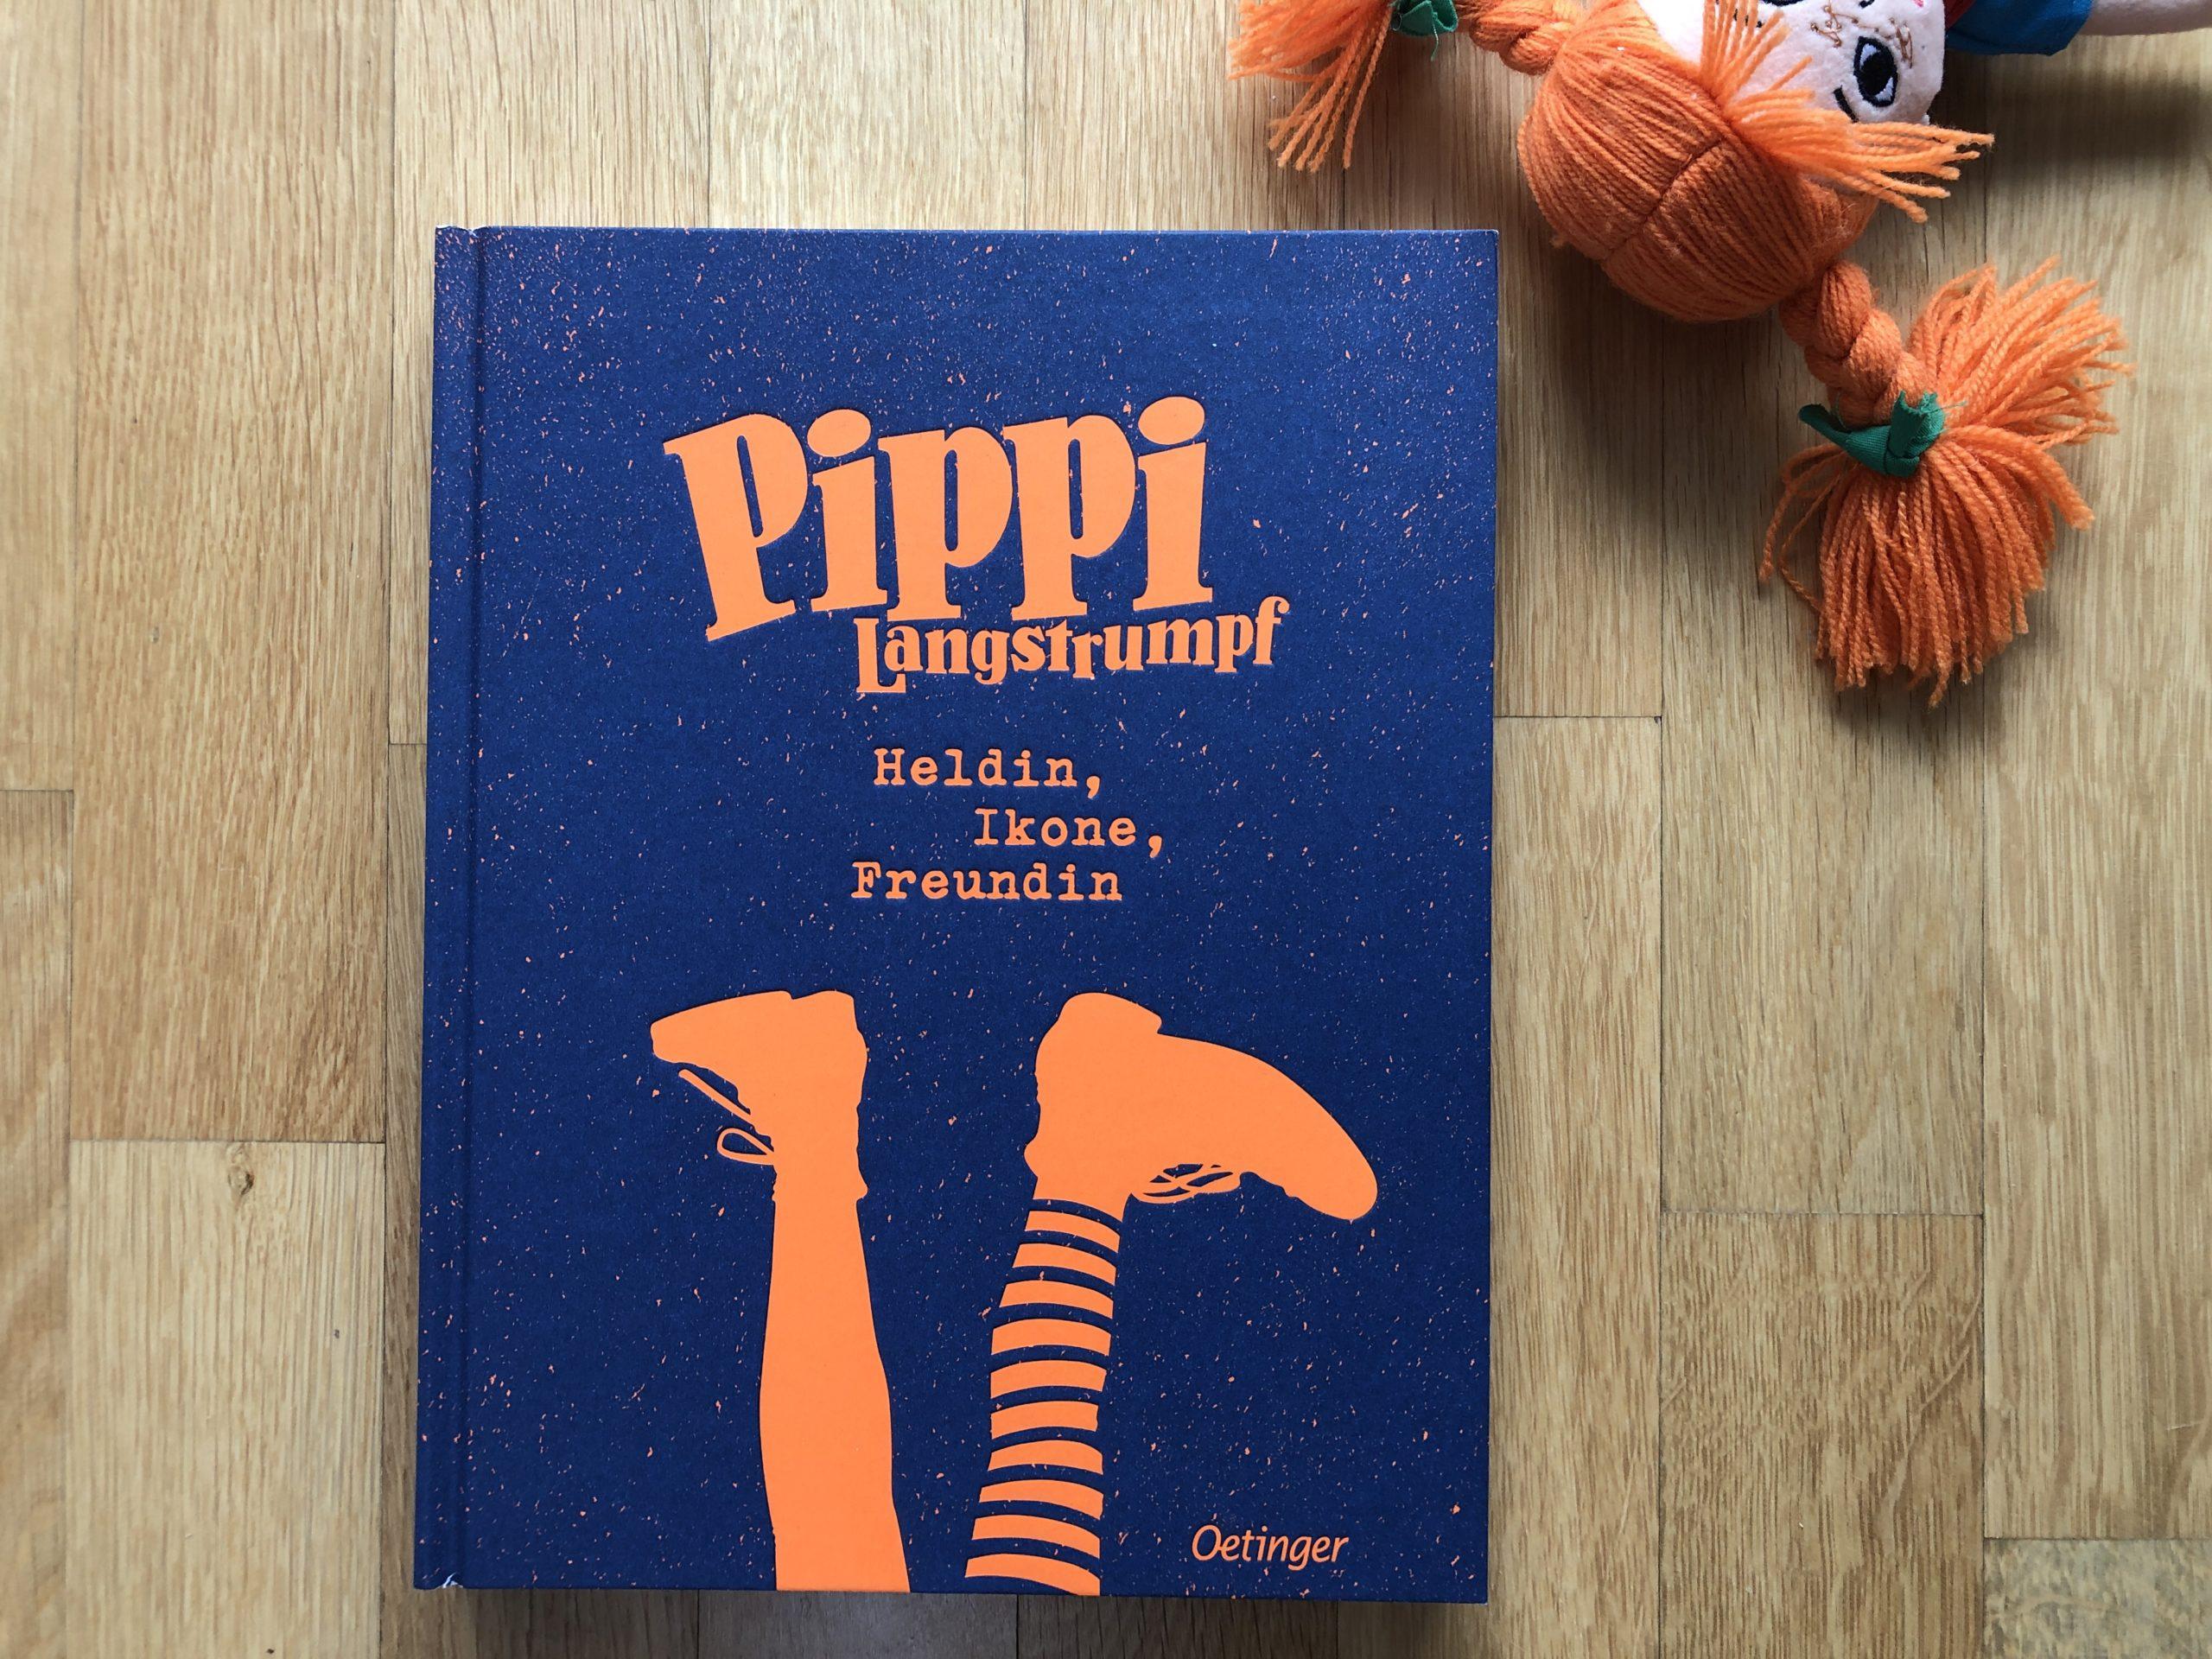 Pippi Langstrumpf: Heldin, Ikone, Freundin